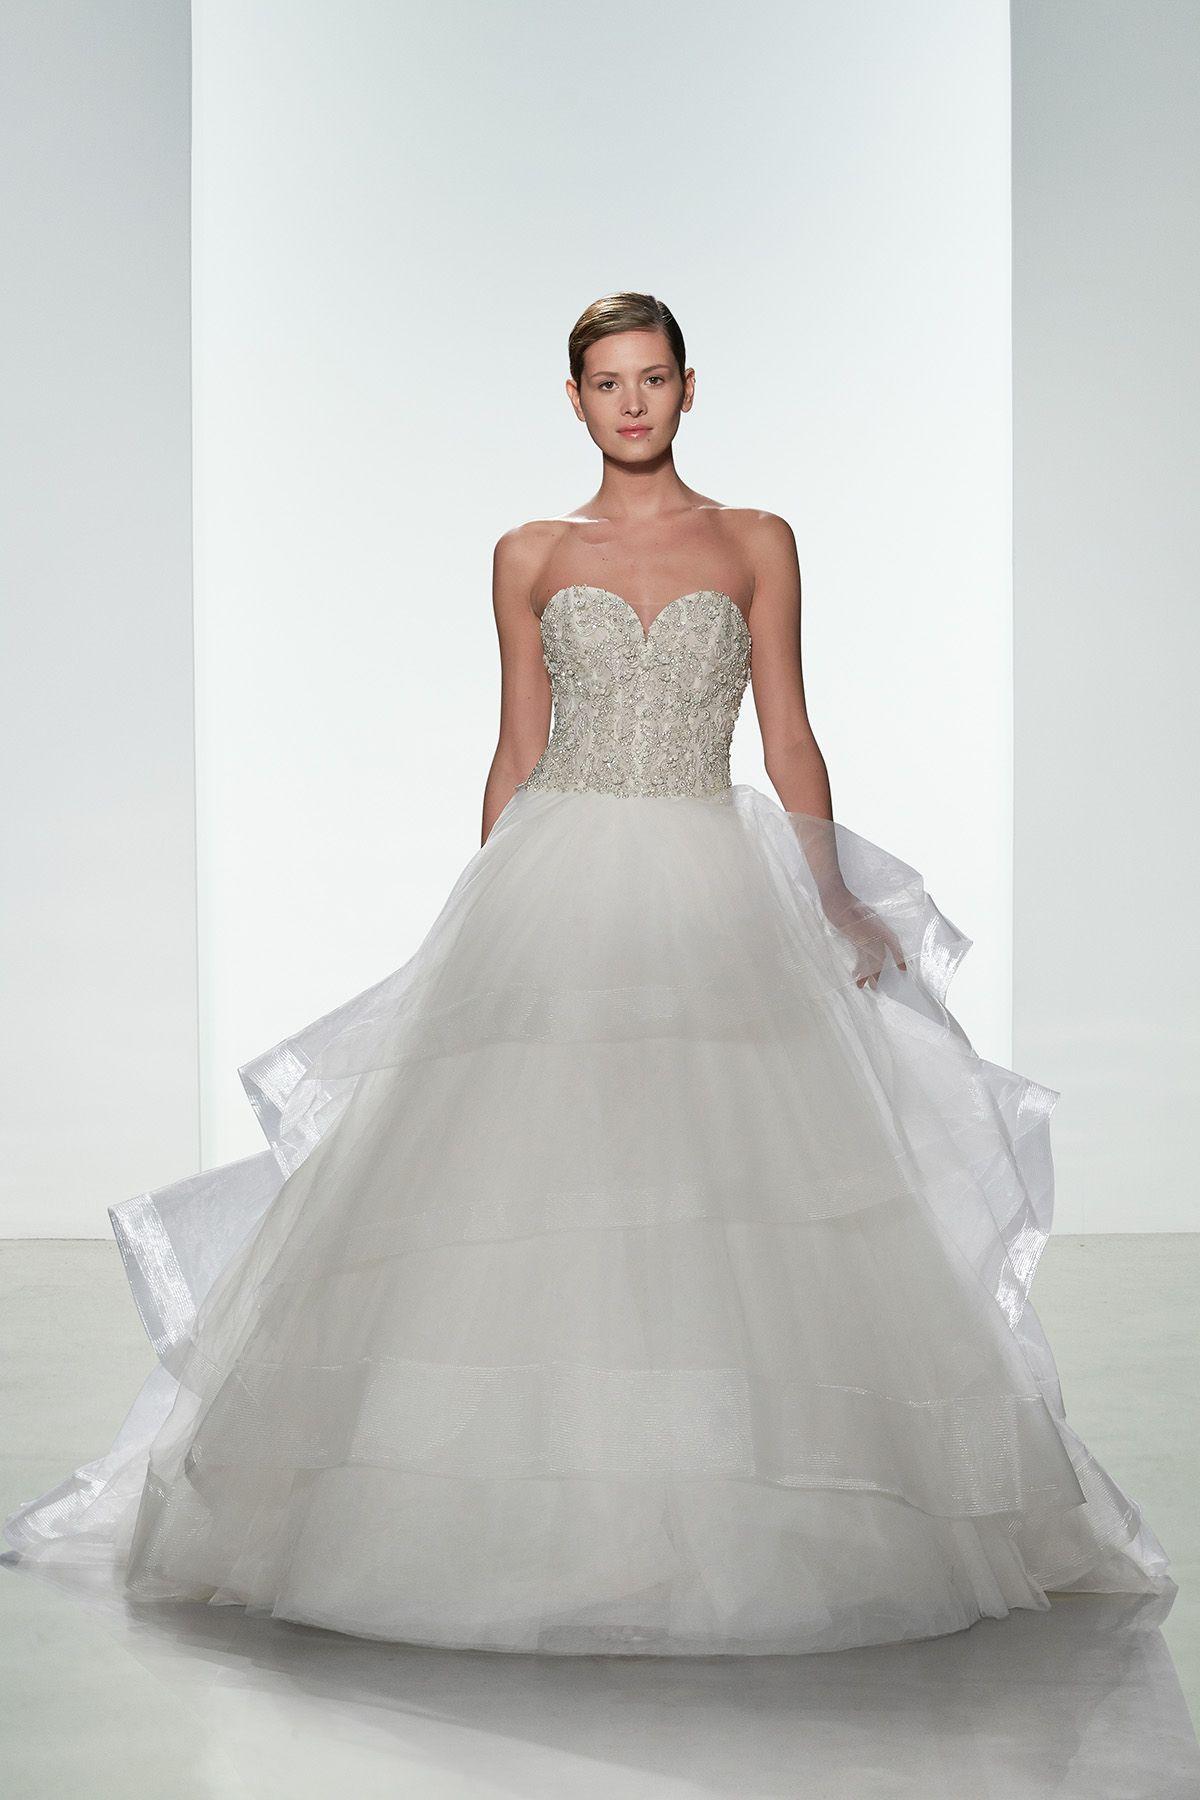 Dress for party wedding  Kenneth Pool Rina  Wedding Dresses  Pinterest  Wedding dress and